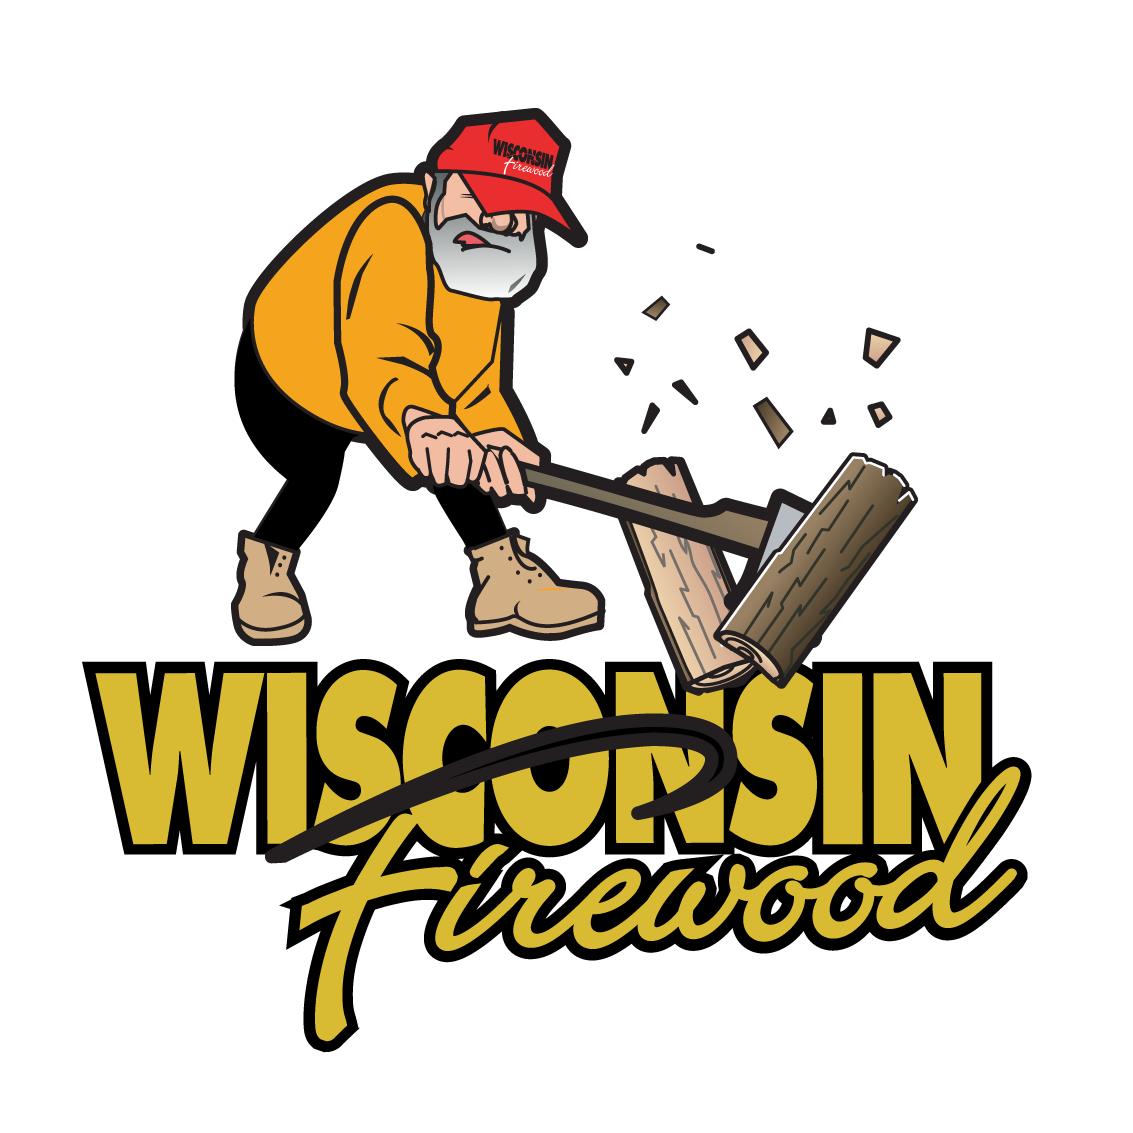 Wisconsin Firewood Company